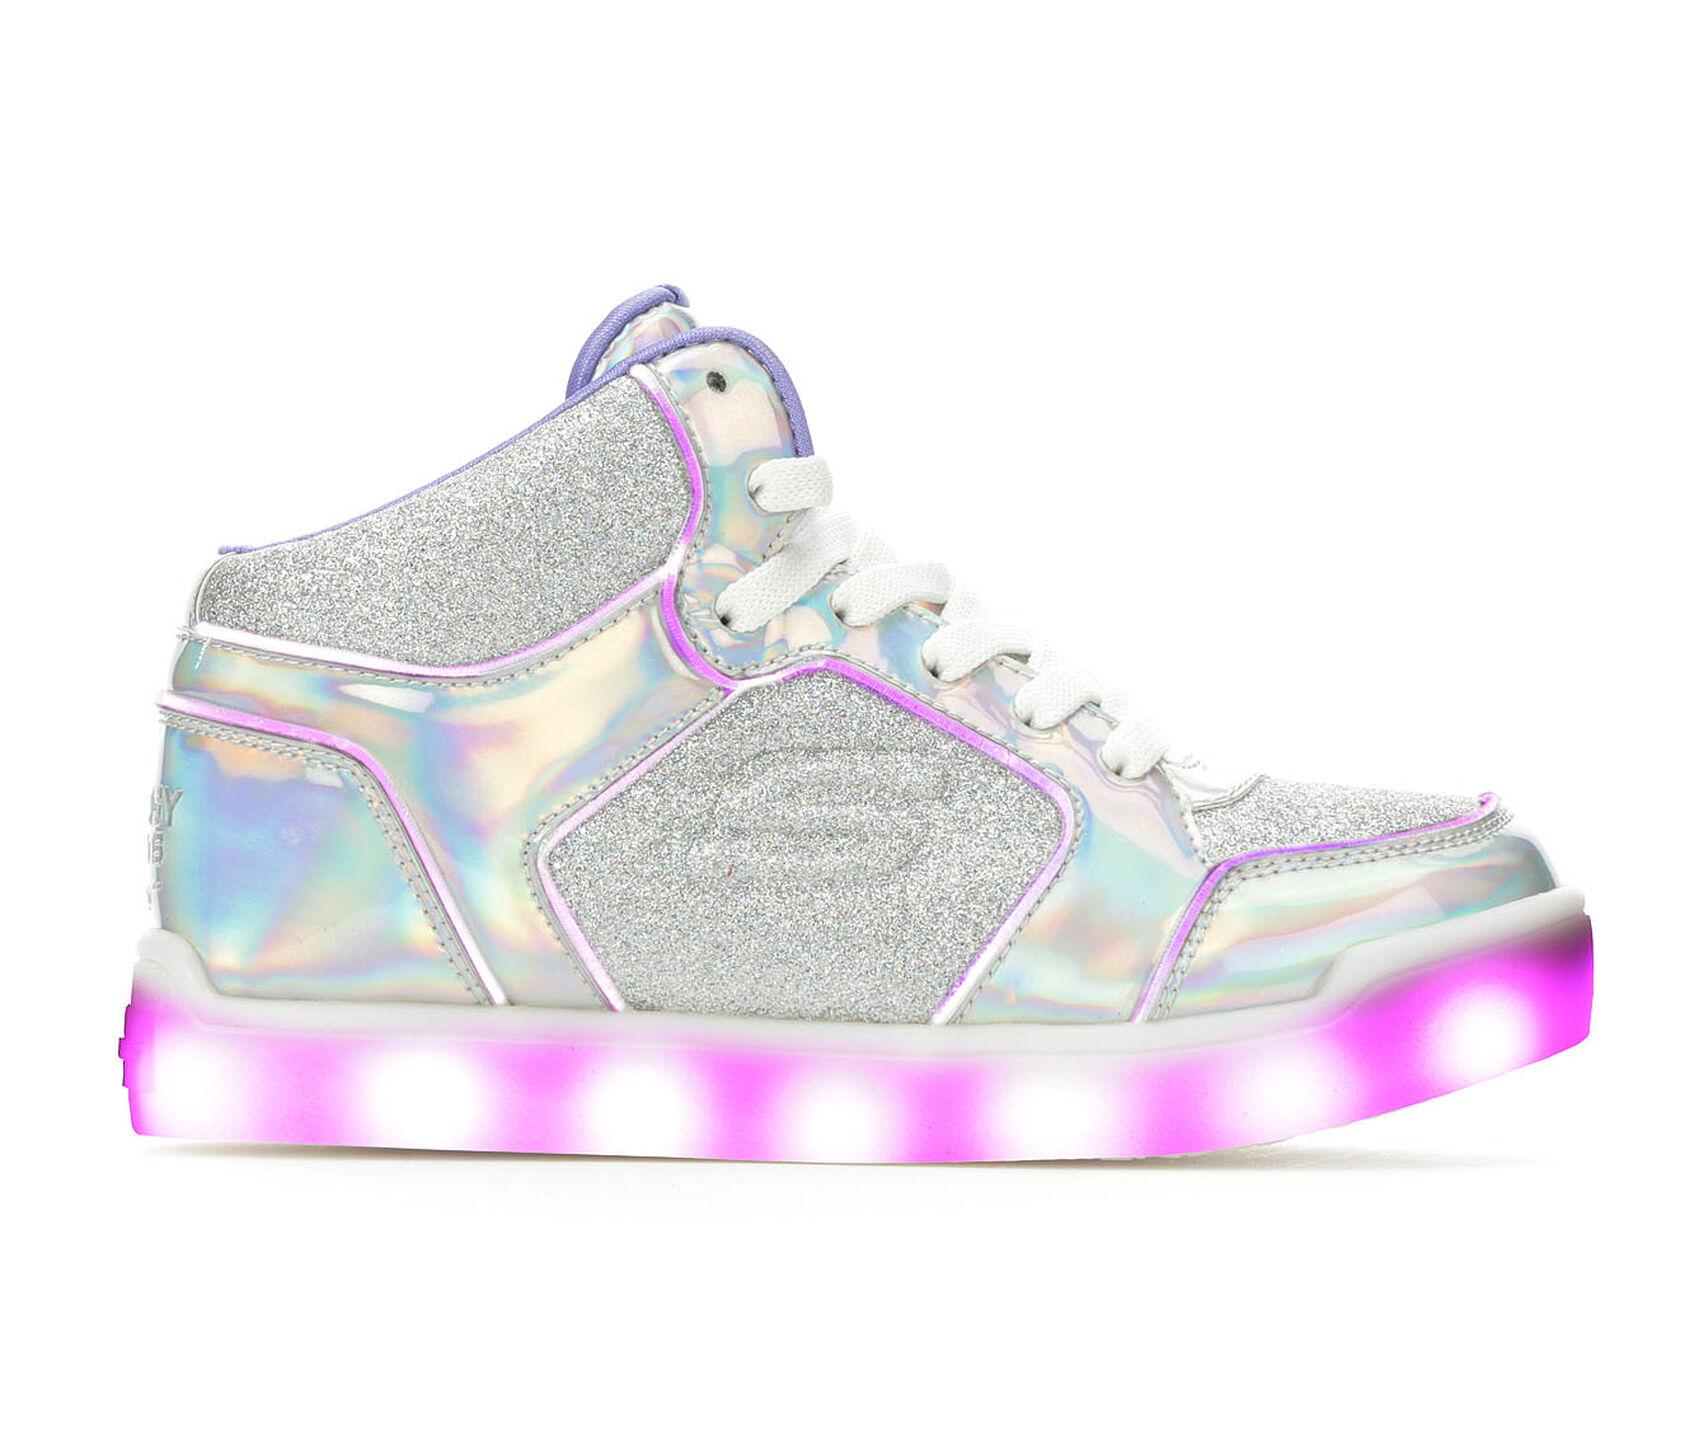 6fcbed0186811 ... Skechers Little Kid  amp  Big Kid Energy Lights Ultra Light-. Previous